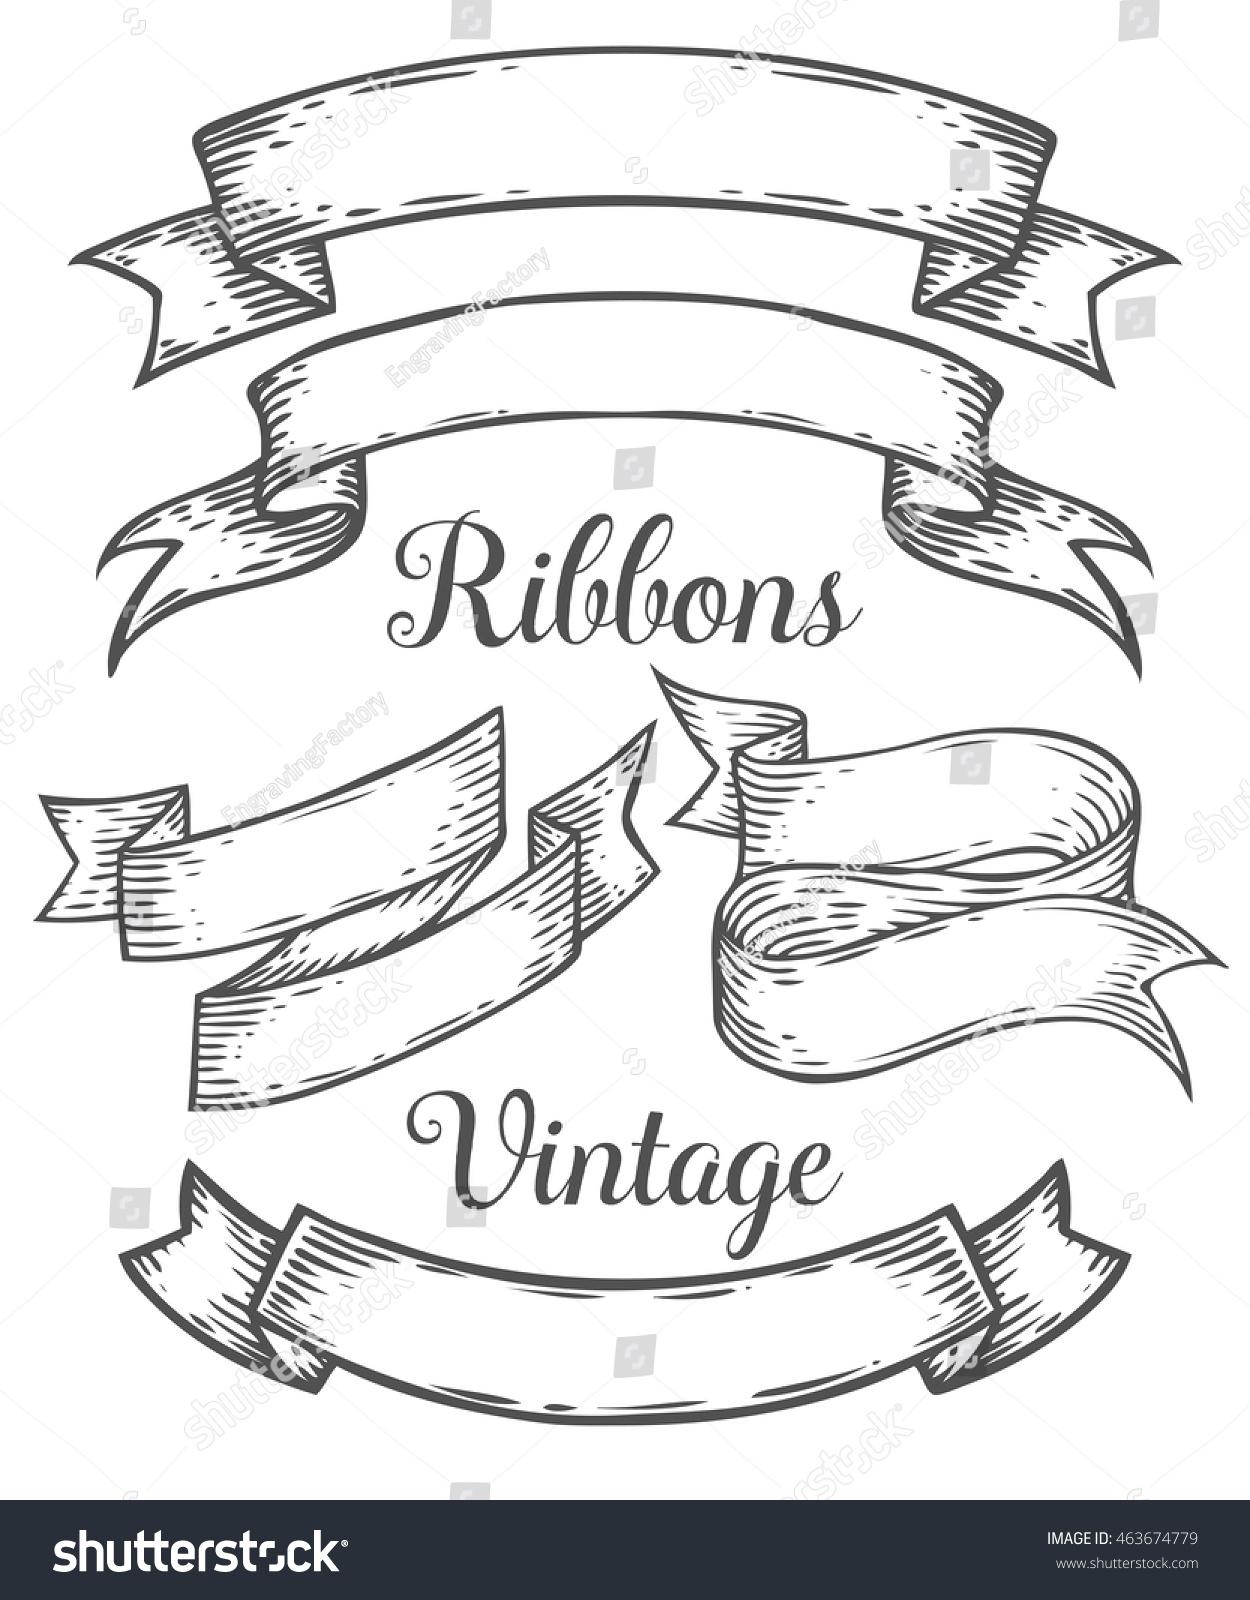 Line Art Ribbon : Ribbon retro vintage hand drawn illustration stock vector